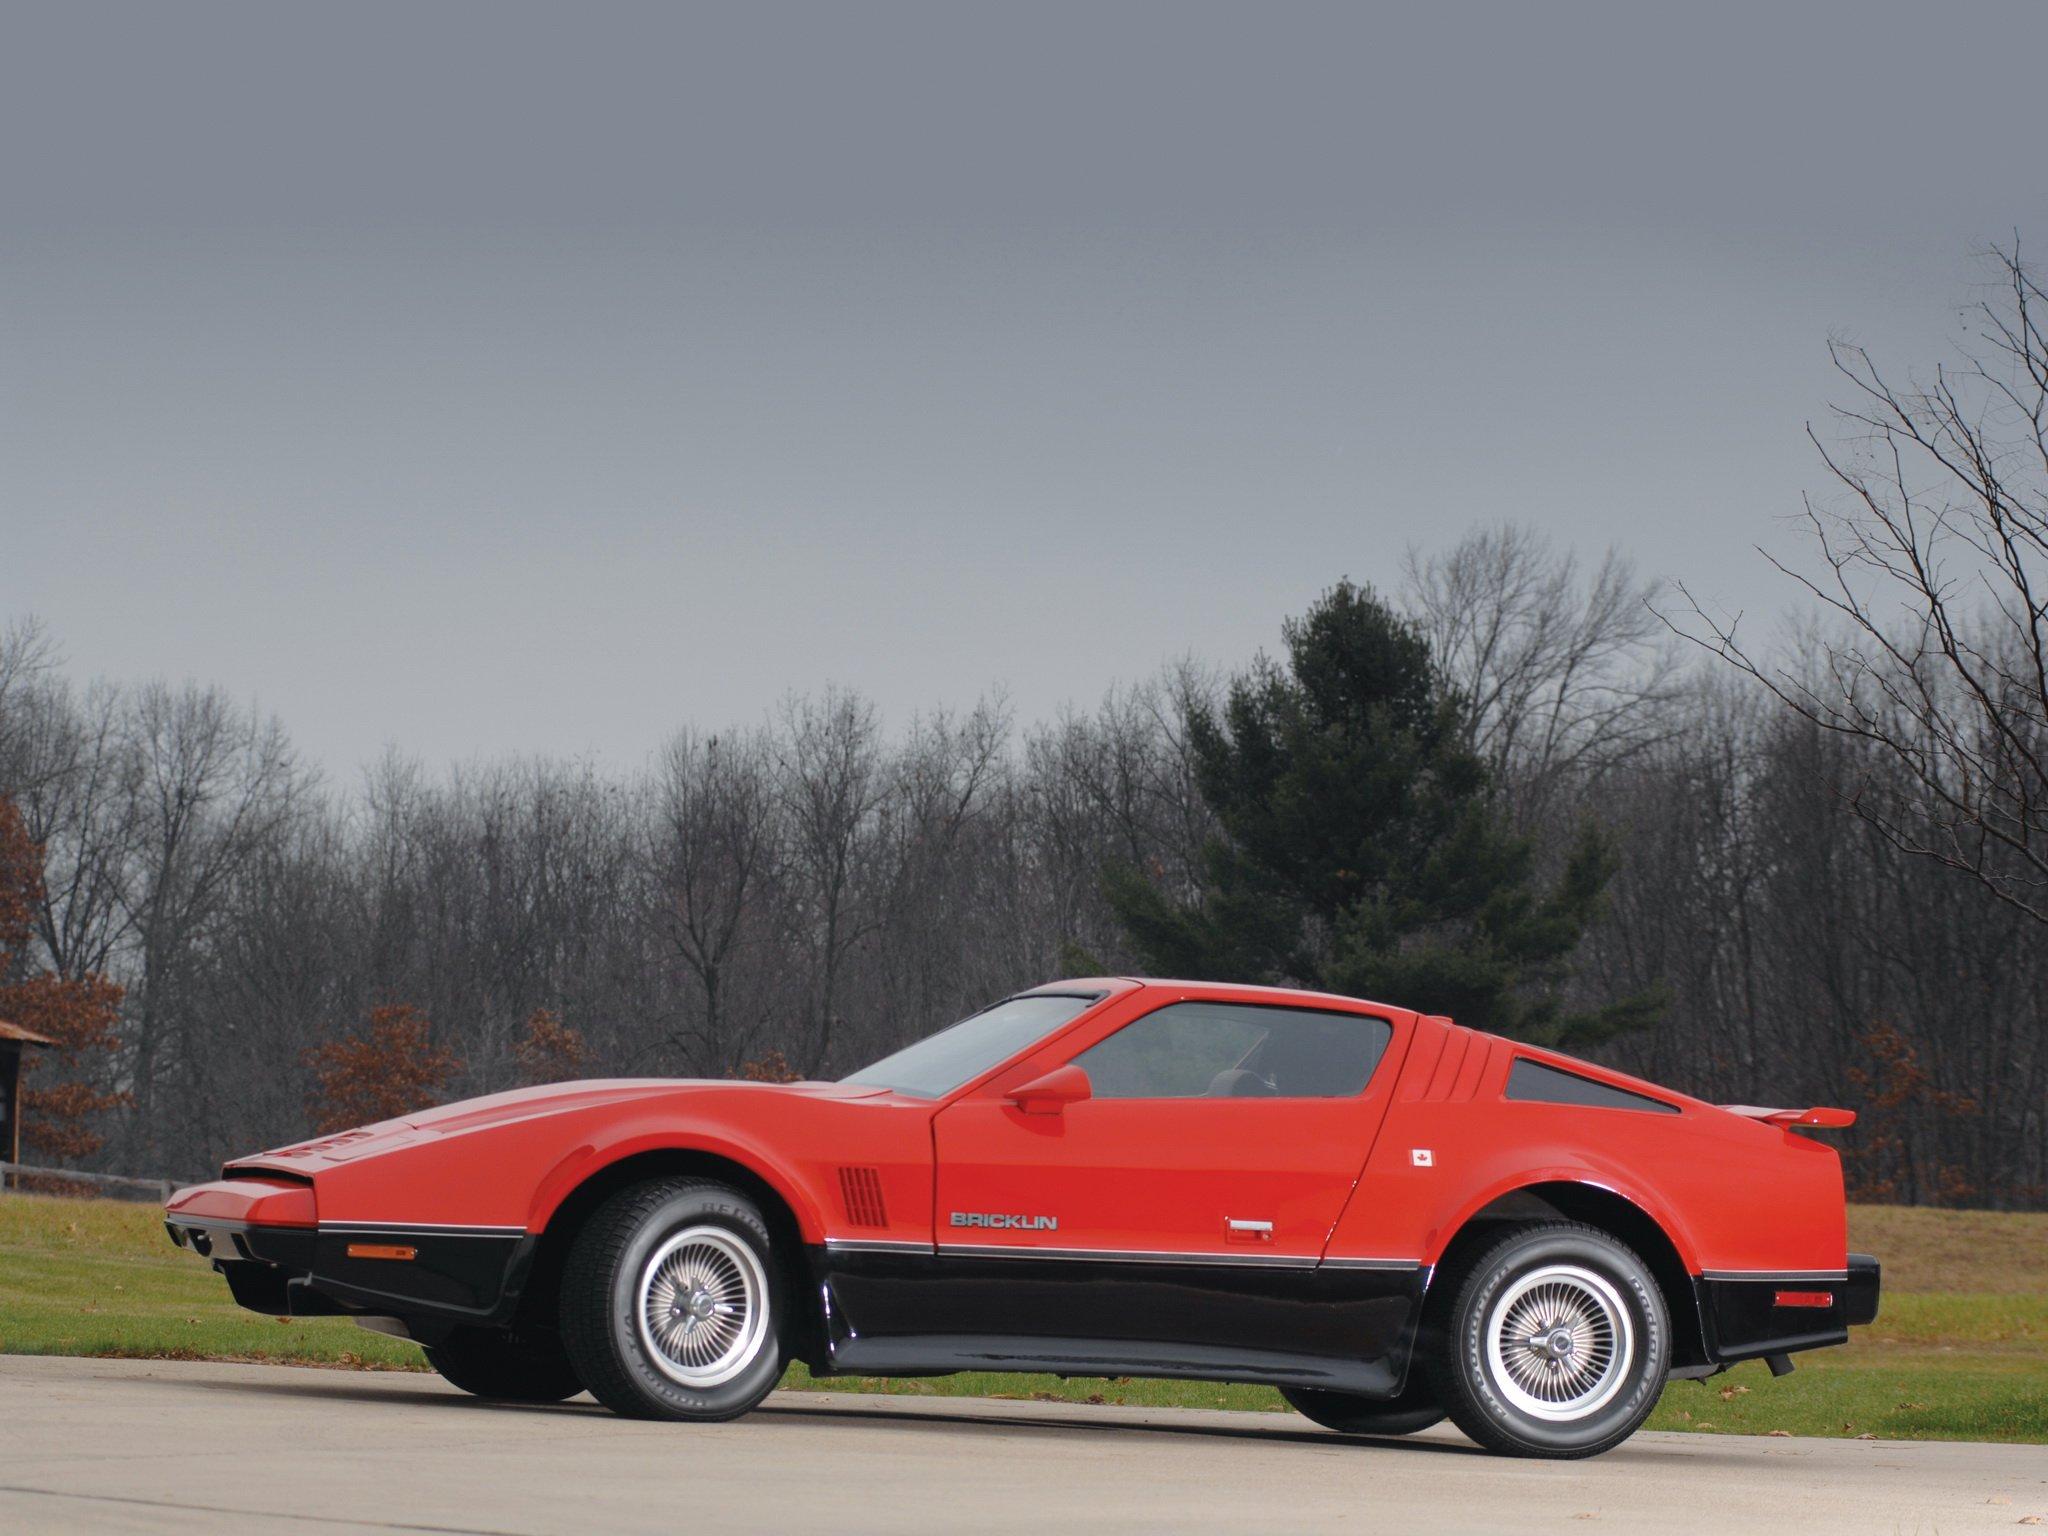 2 Person Car >> 1975 Bricklin SV-1 supercar f wallpaper | 2048x1536 ...